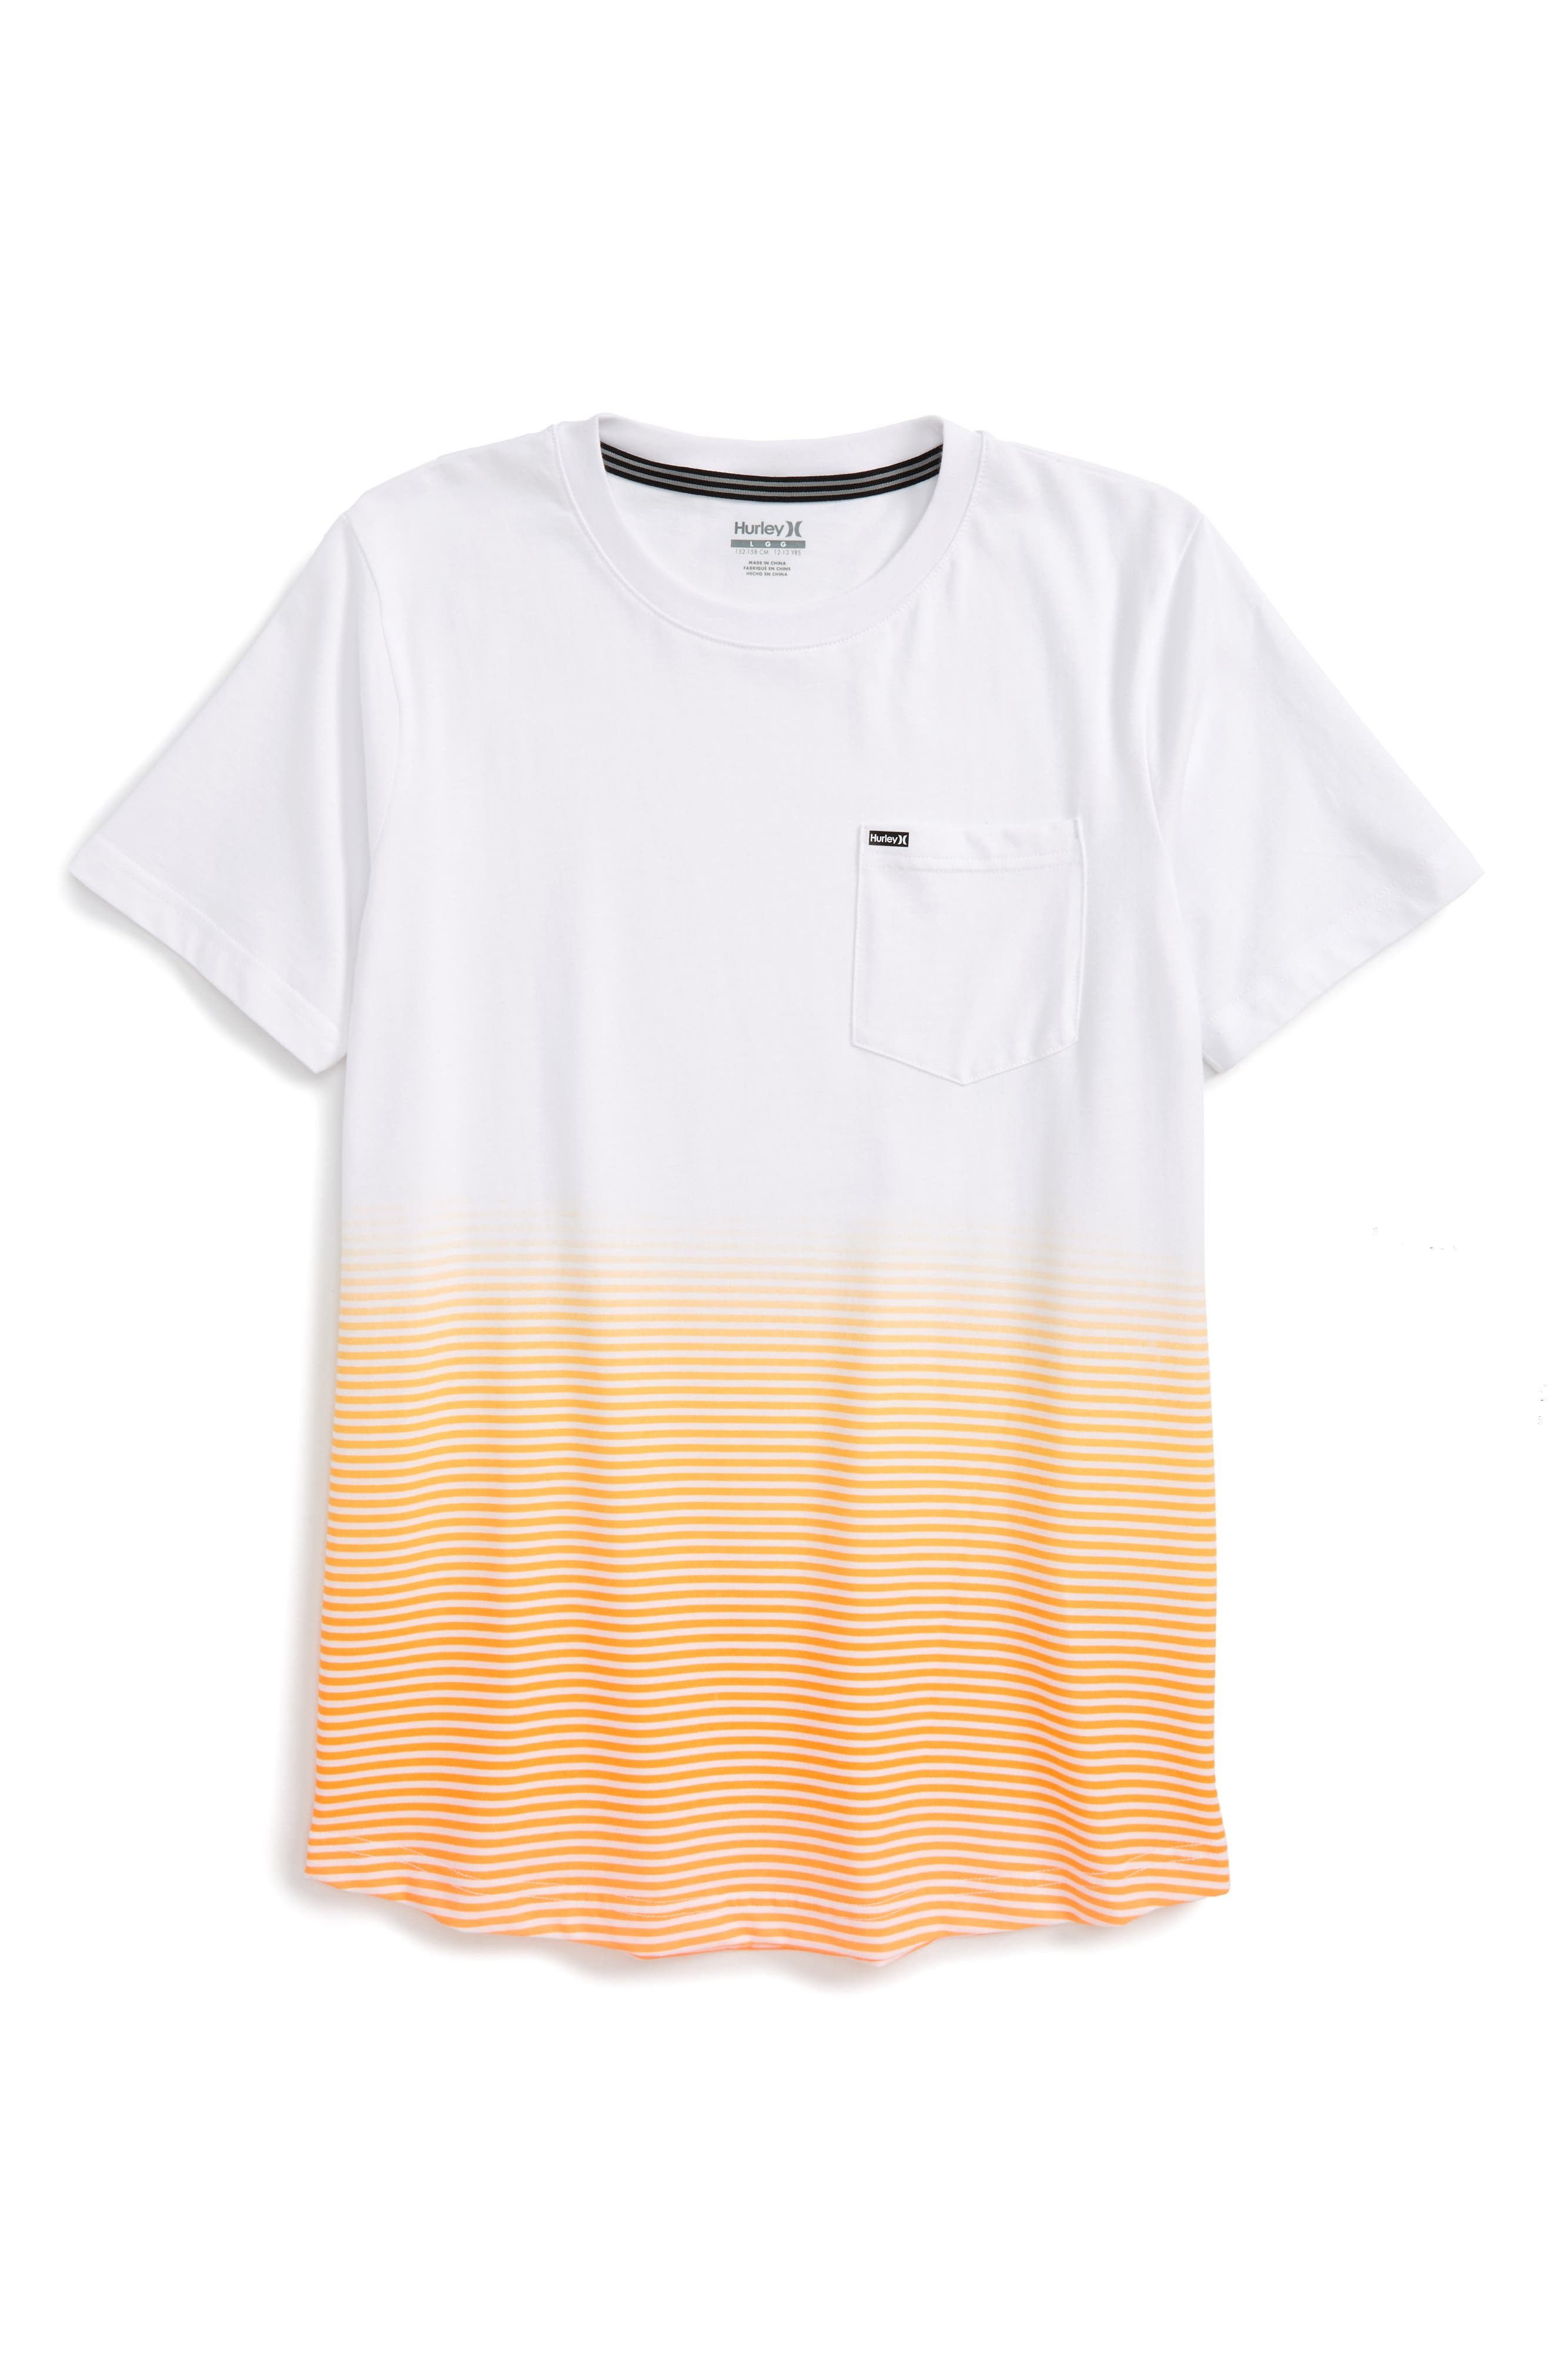 Main Image - Hurley Ombré Stripe T-Shirt (Big Boys)